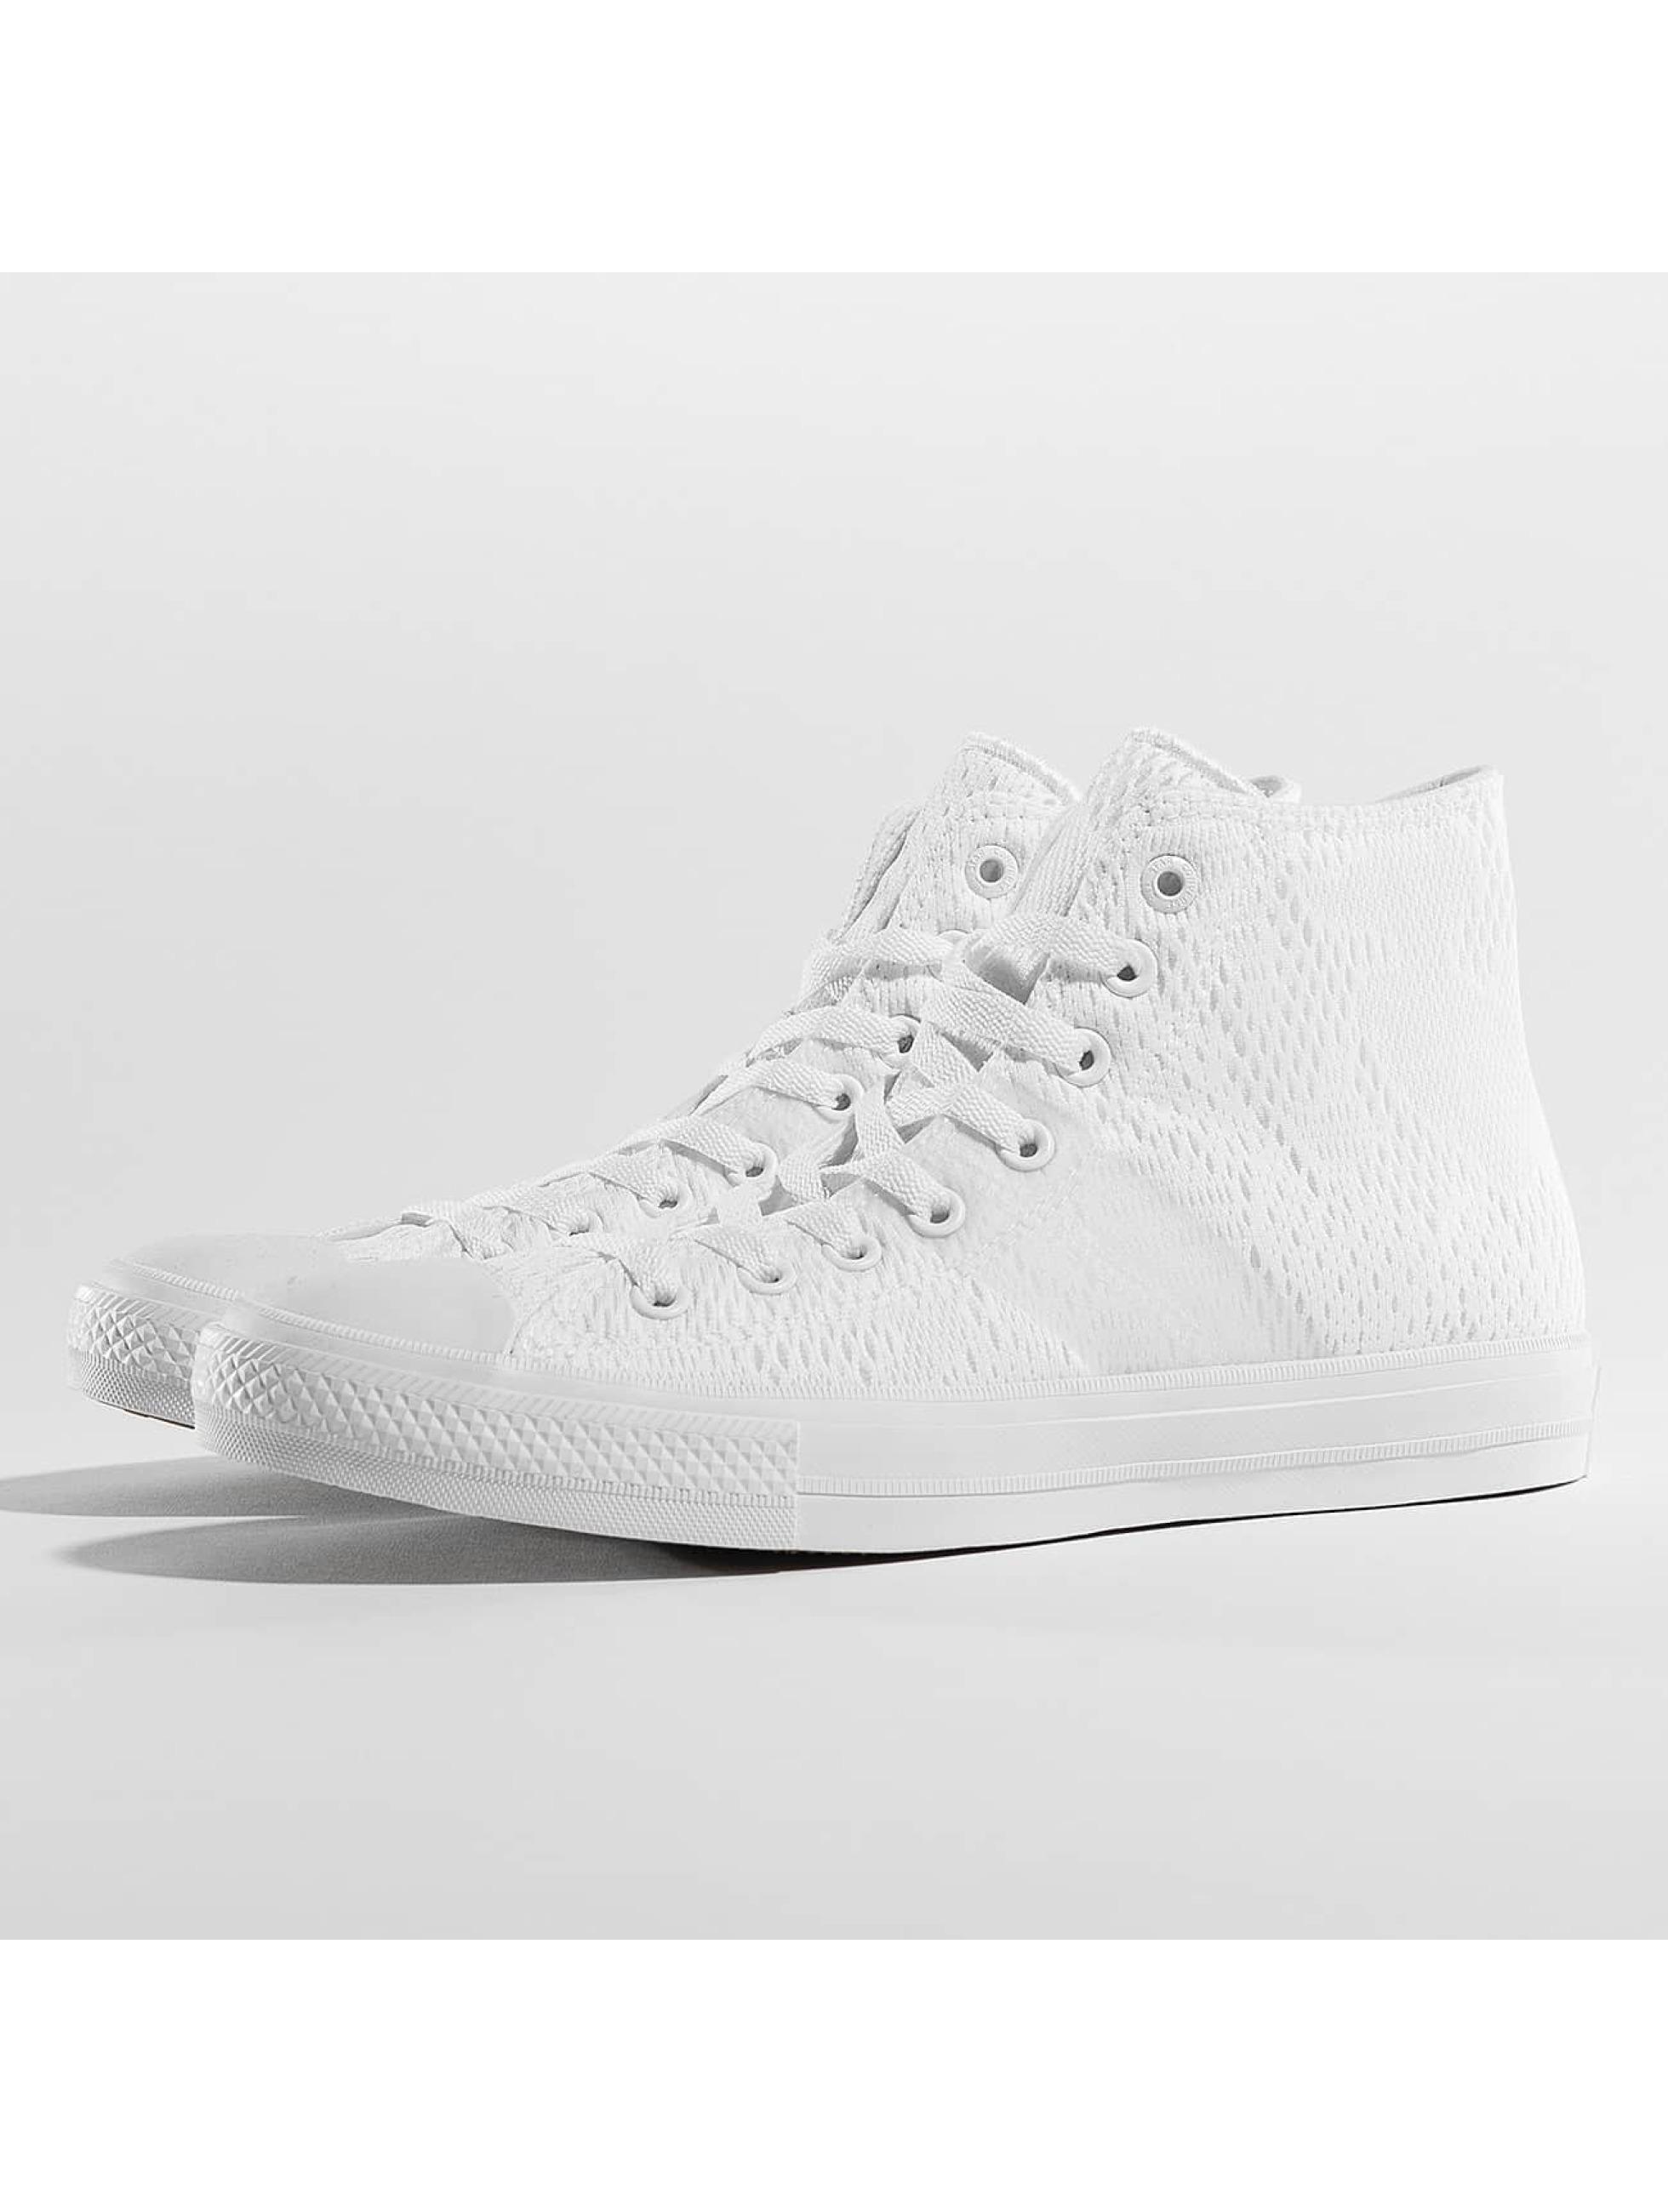 Converse Männer Sneaker CTAS II Engineered Mesh High in weiß